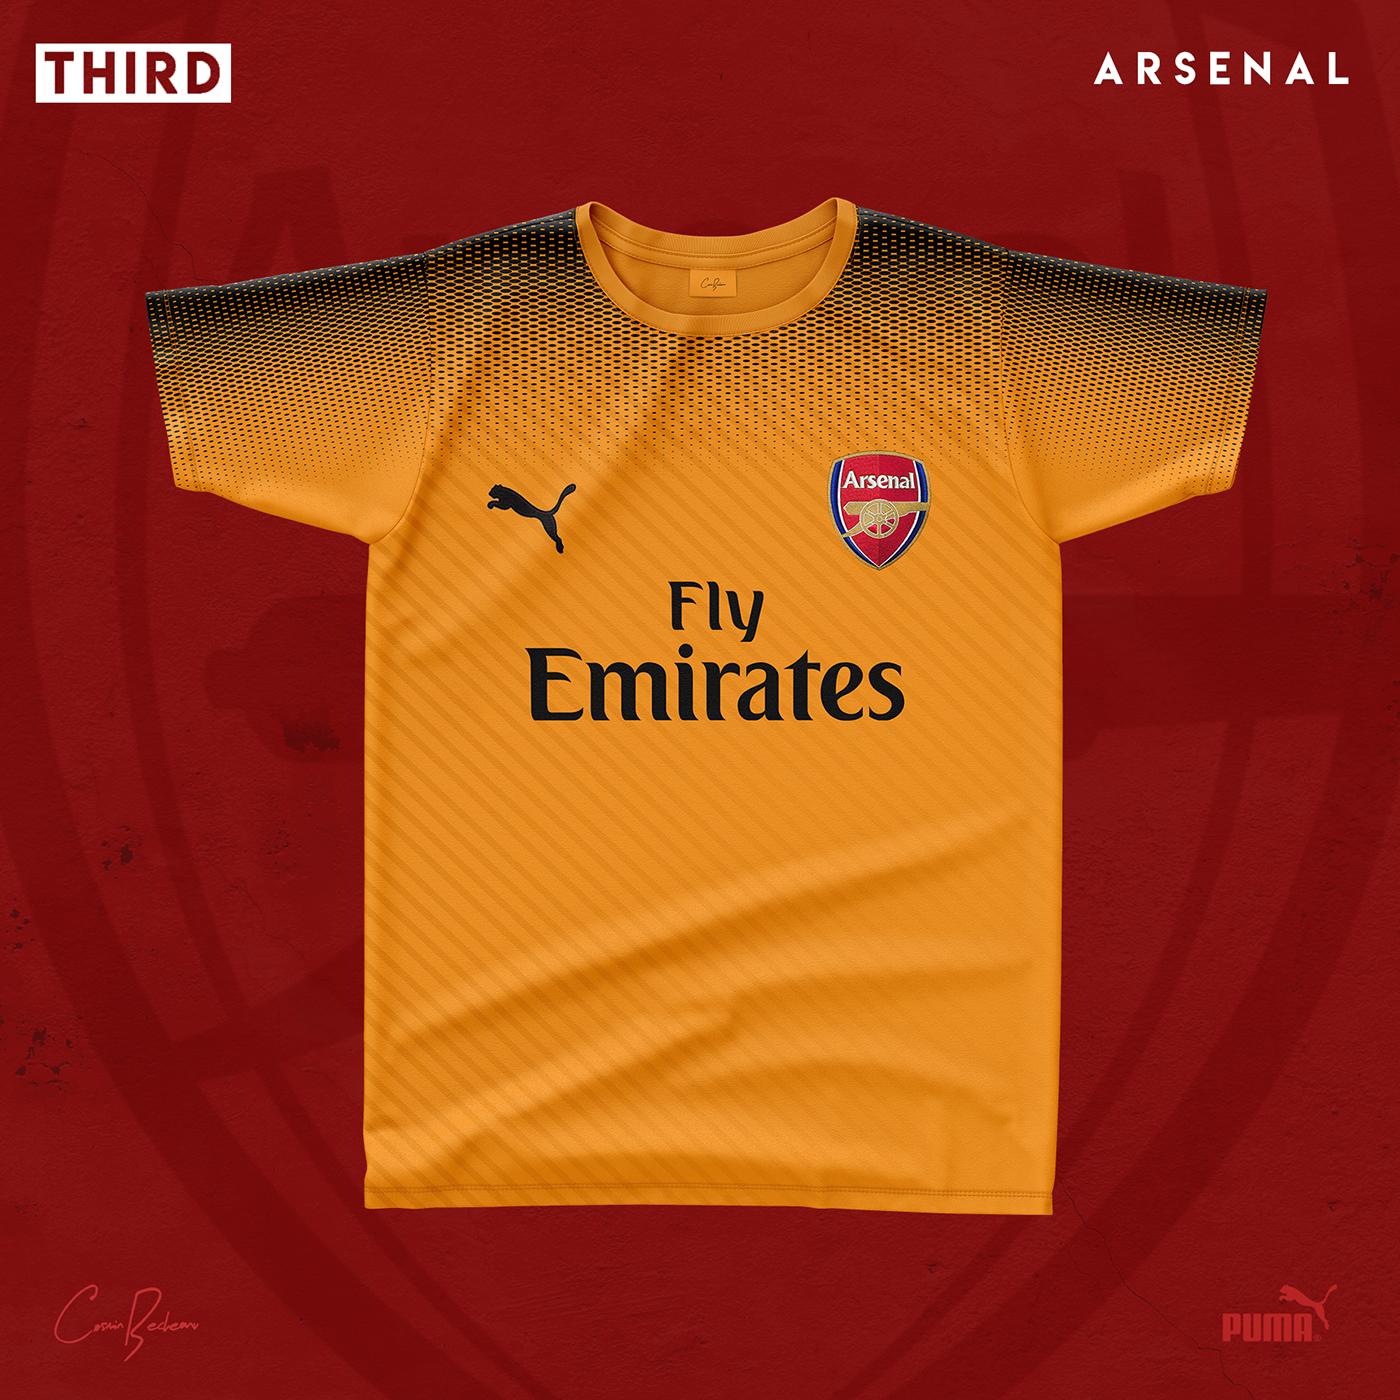 Puma Font 2019 Download Arsenal